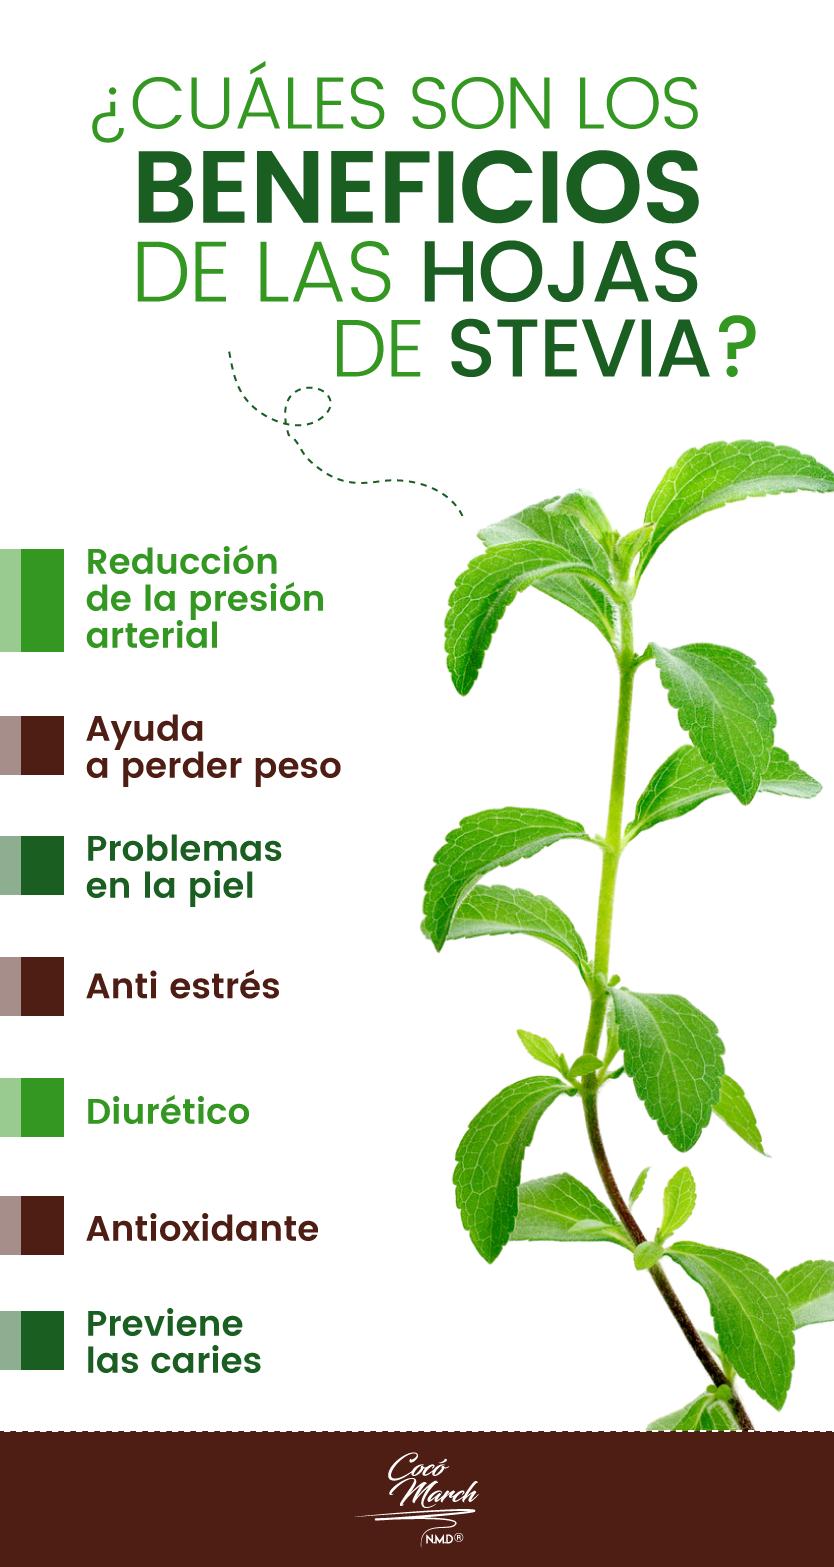 Planta stevia para bajar de peso